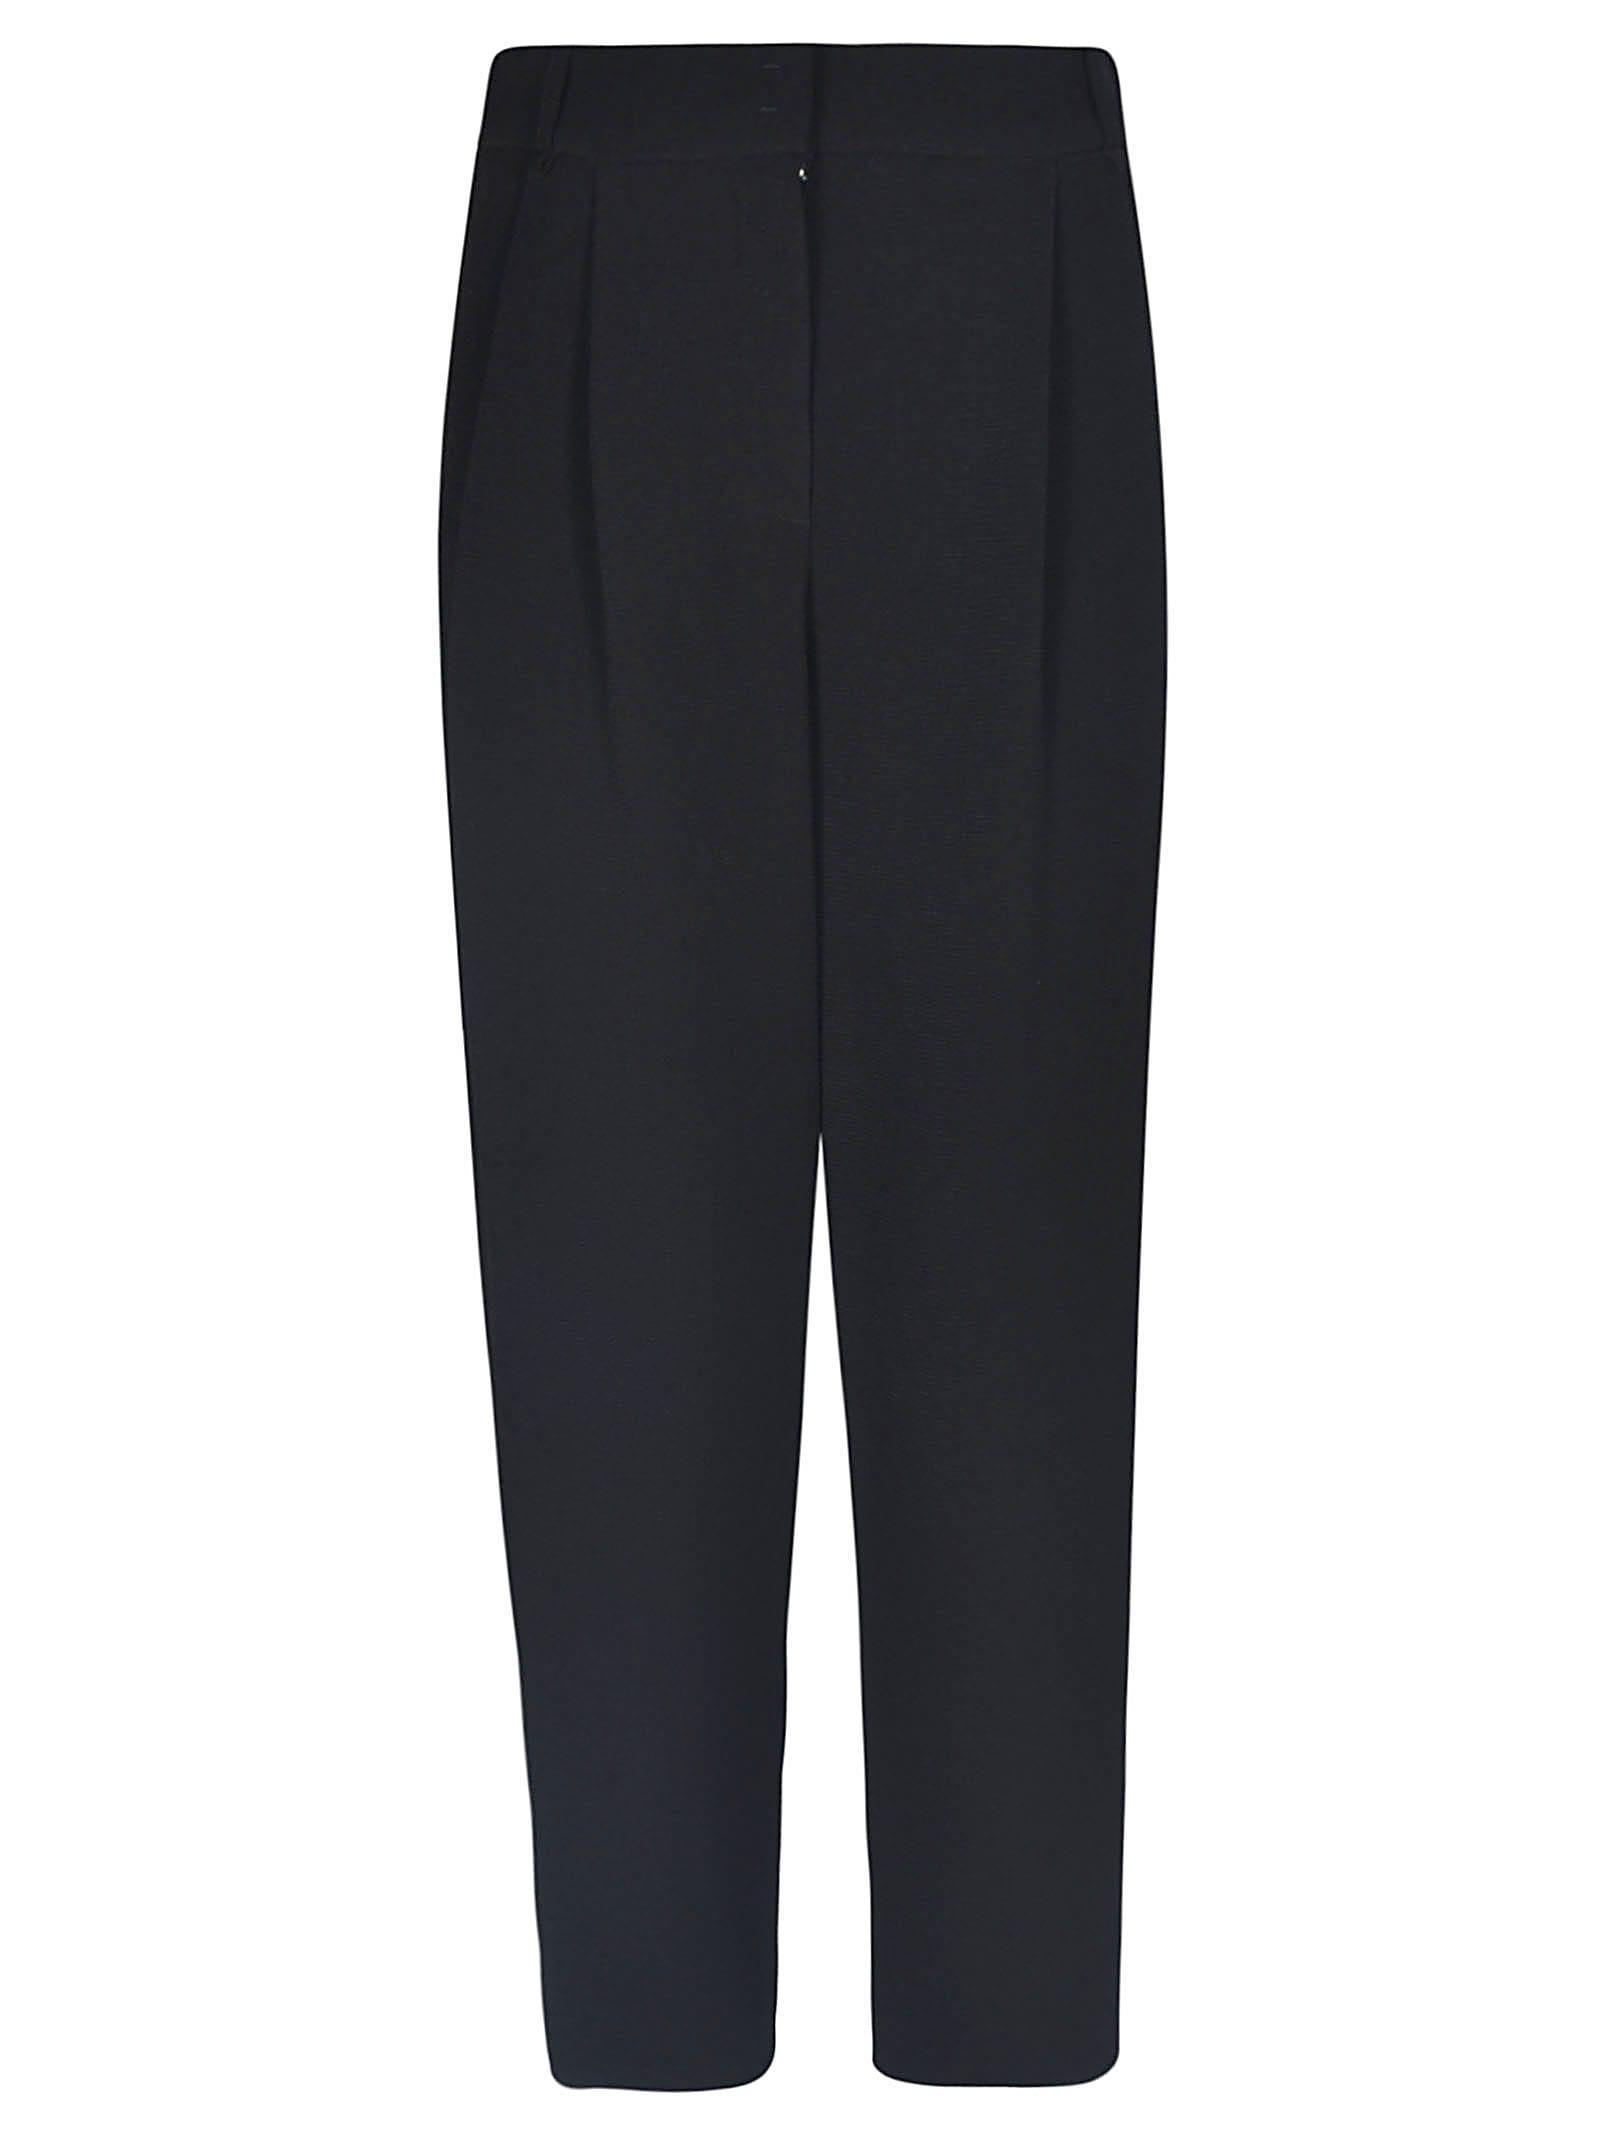 Emporio Armani Pants